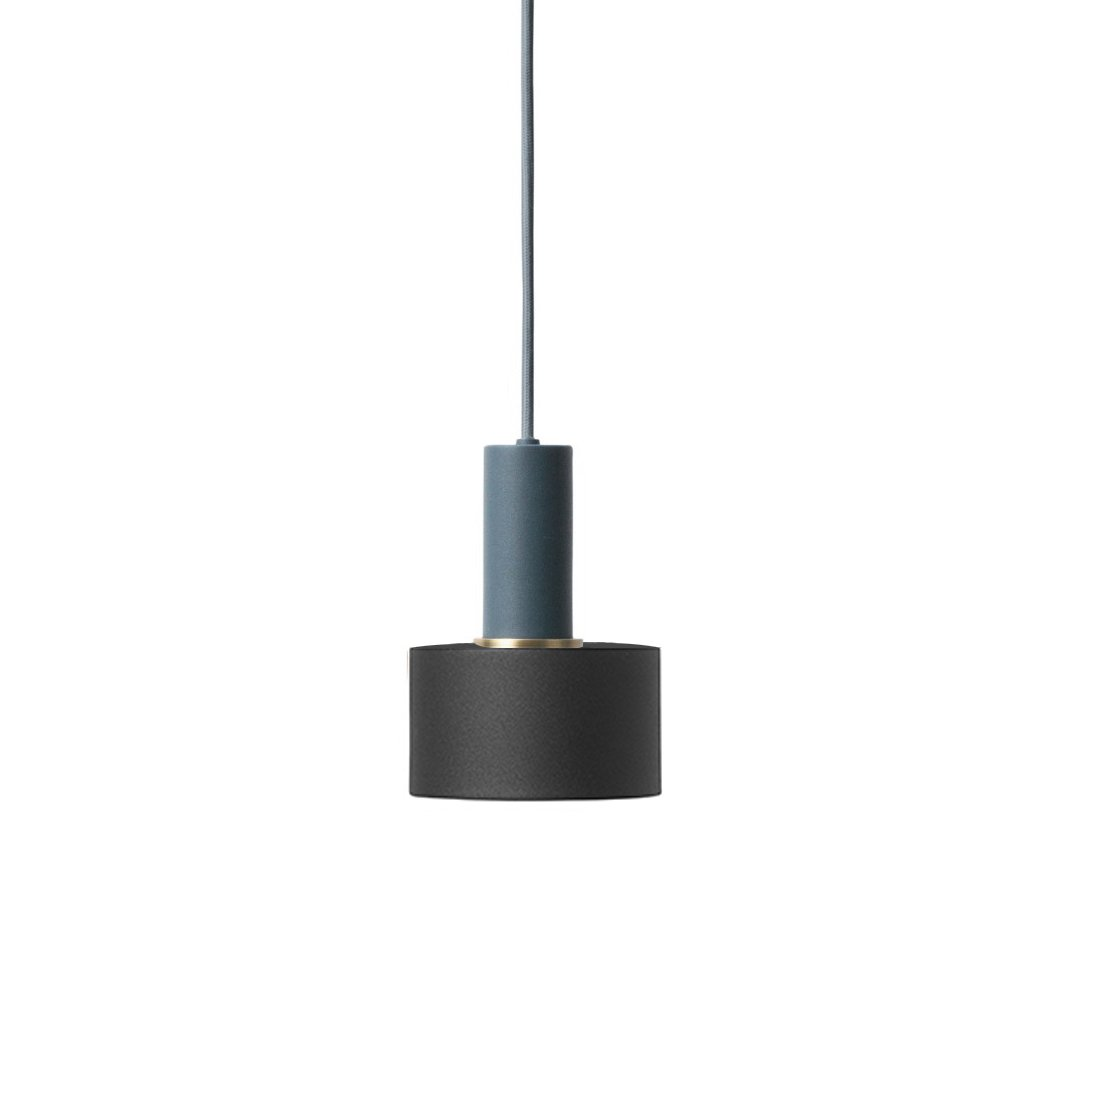 Ferm Living Collect Disc Low Hanglamp Donkerblauw Zwart